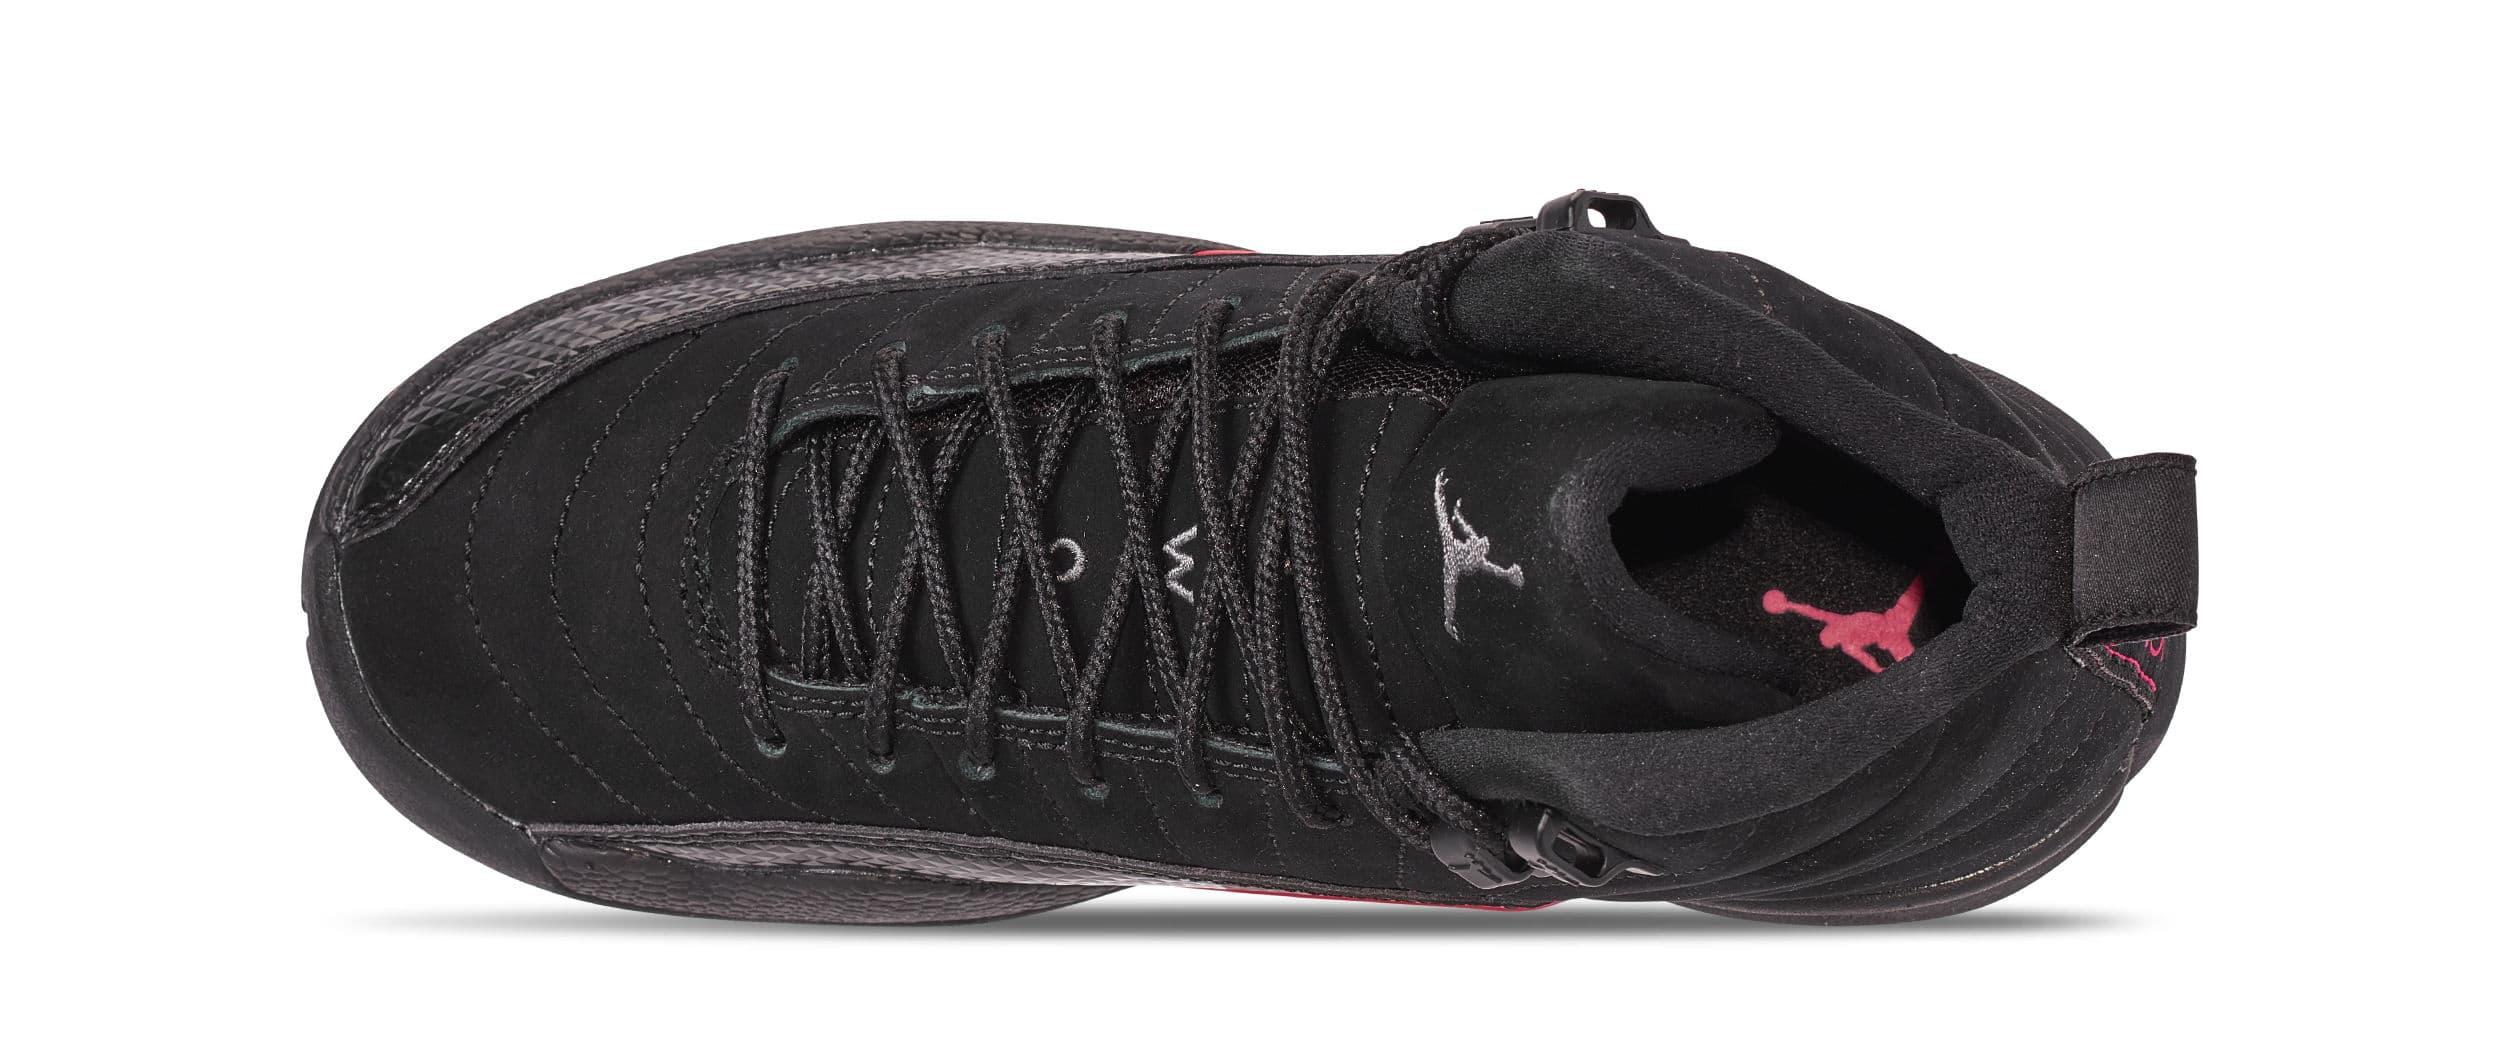 f67043d731f Air Jordan 12 Retro GG 'Black/Dark Grey-Rush Pink' 510815-006 ...